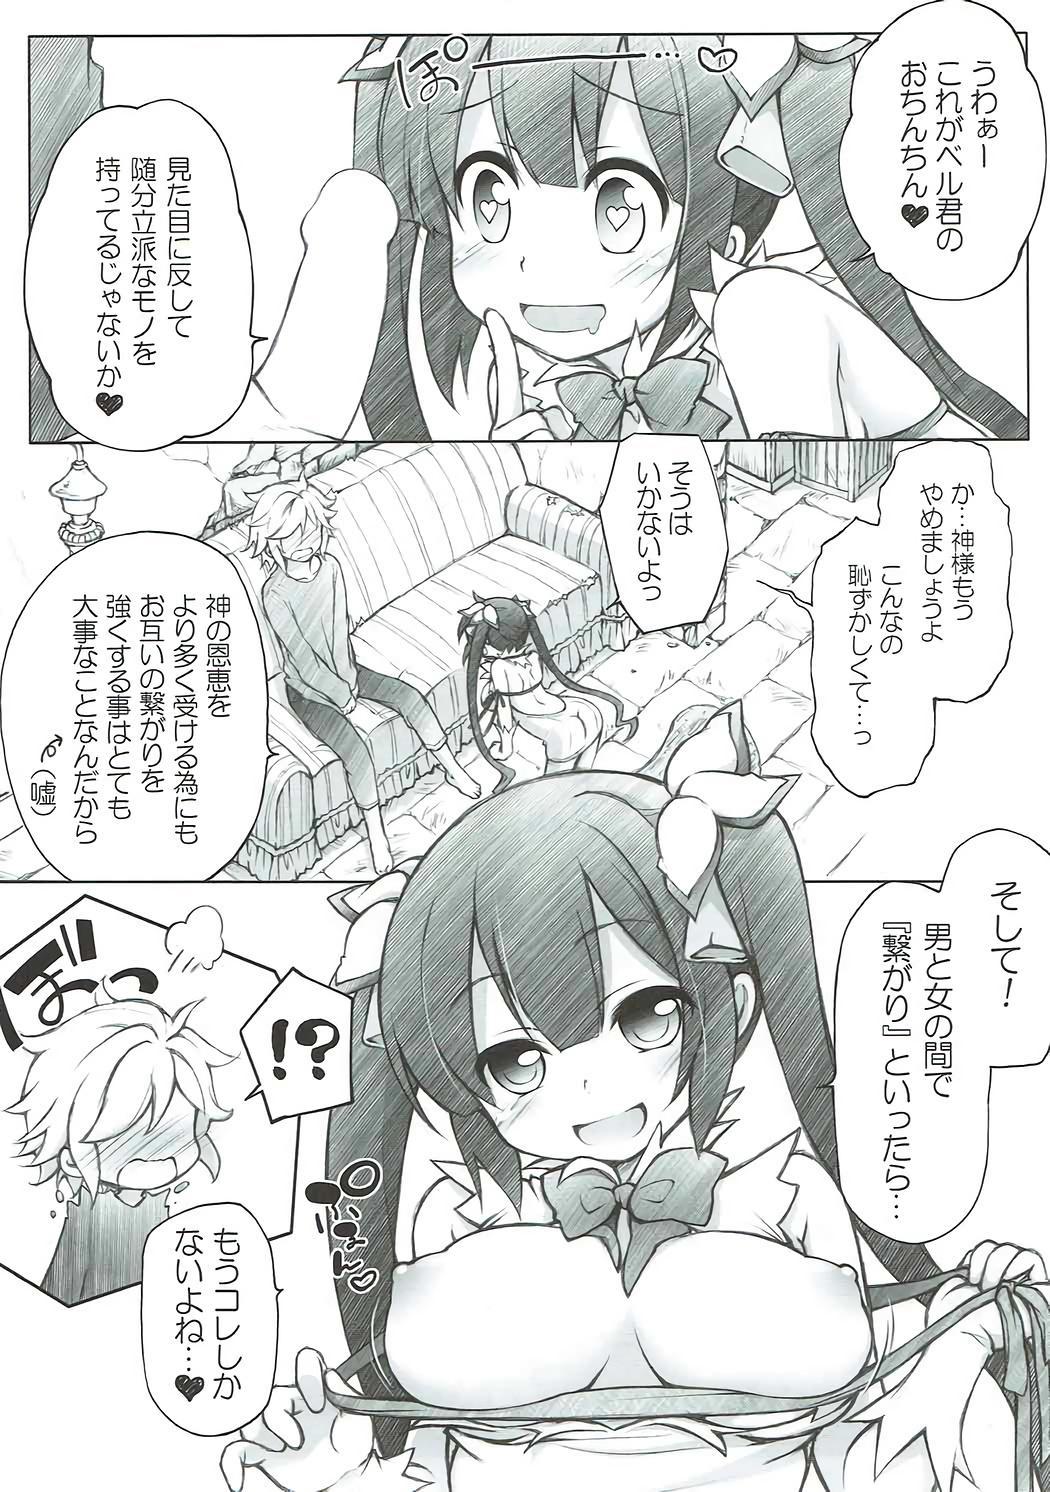 Loli Kamisama Familiax 3